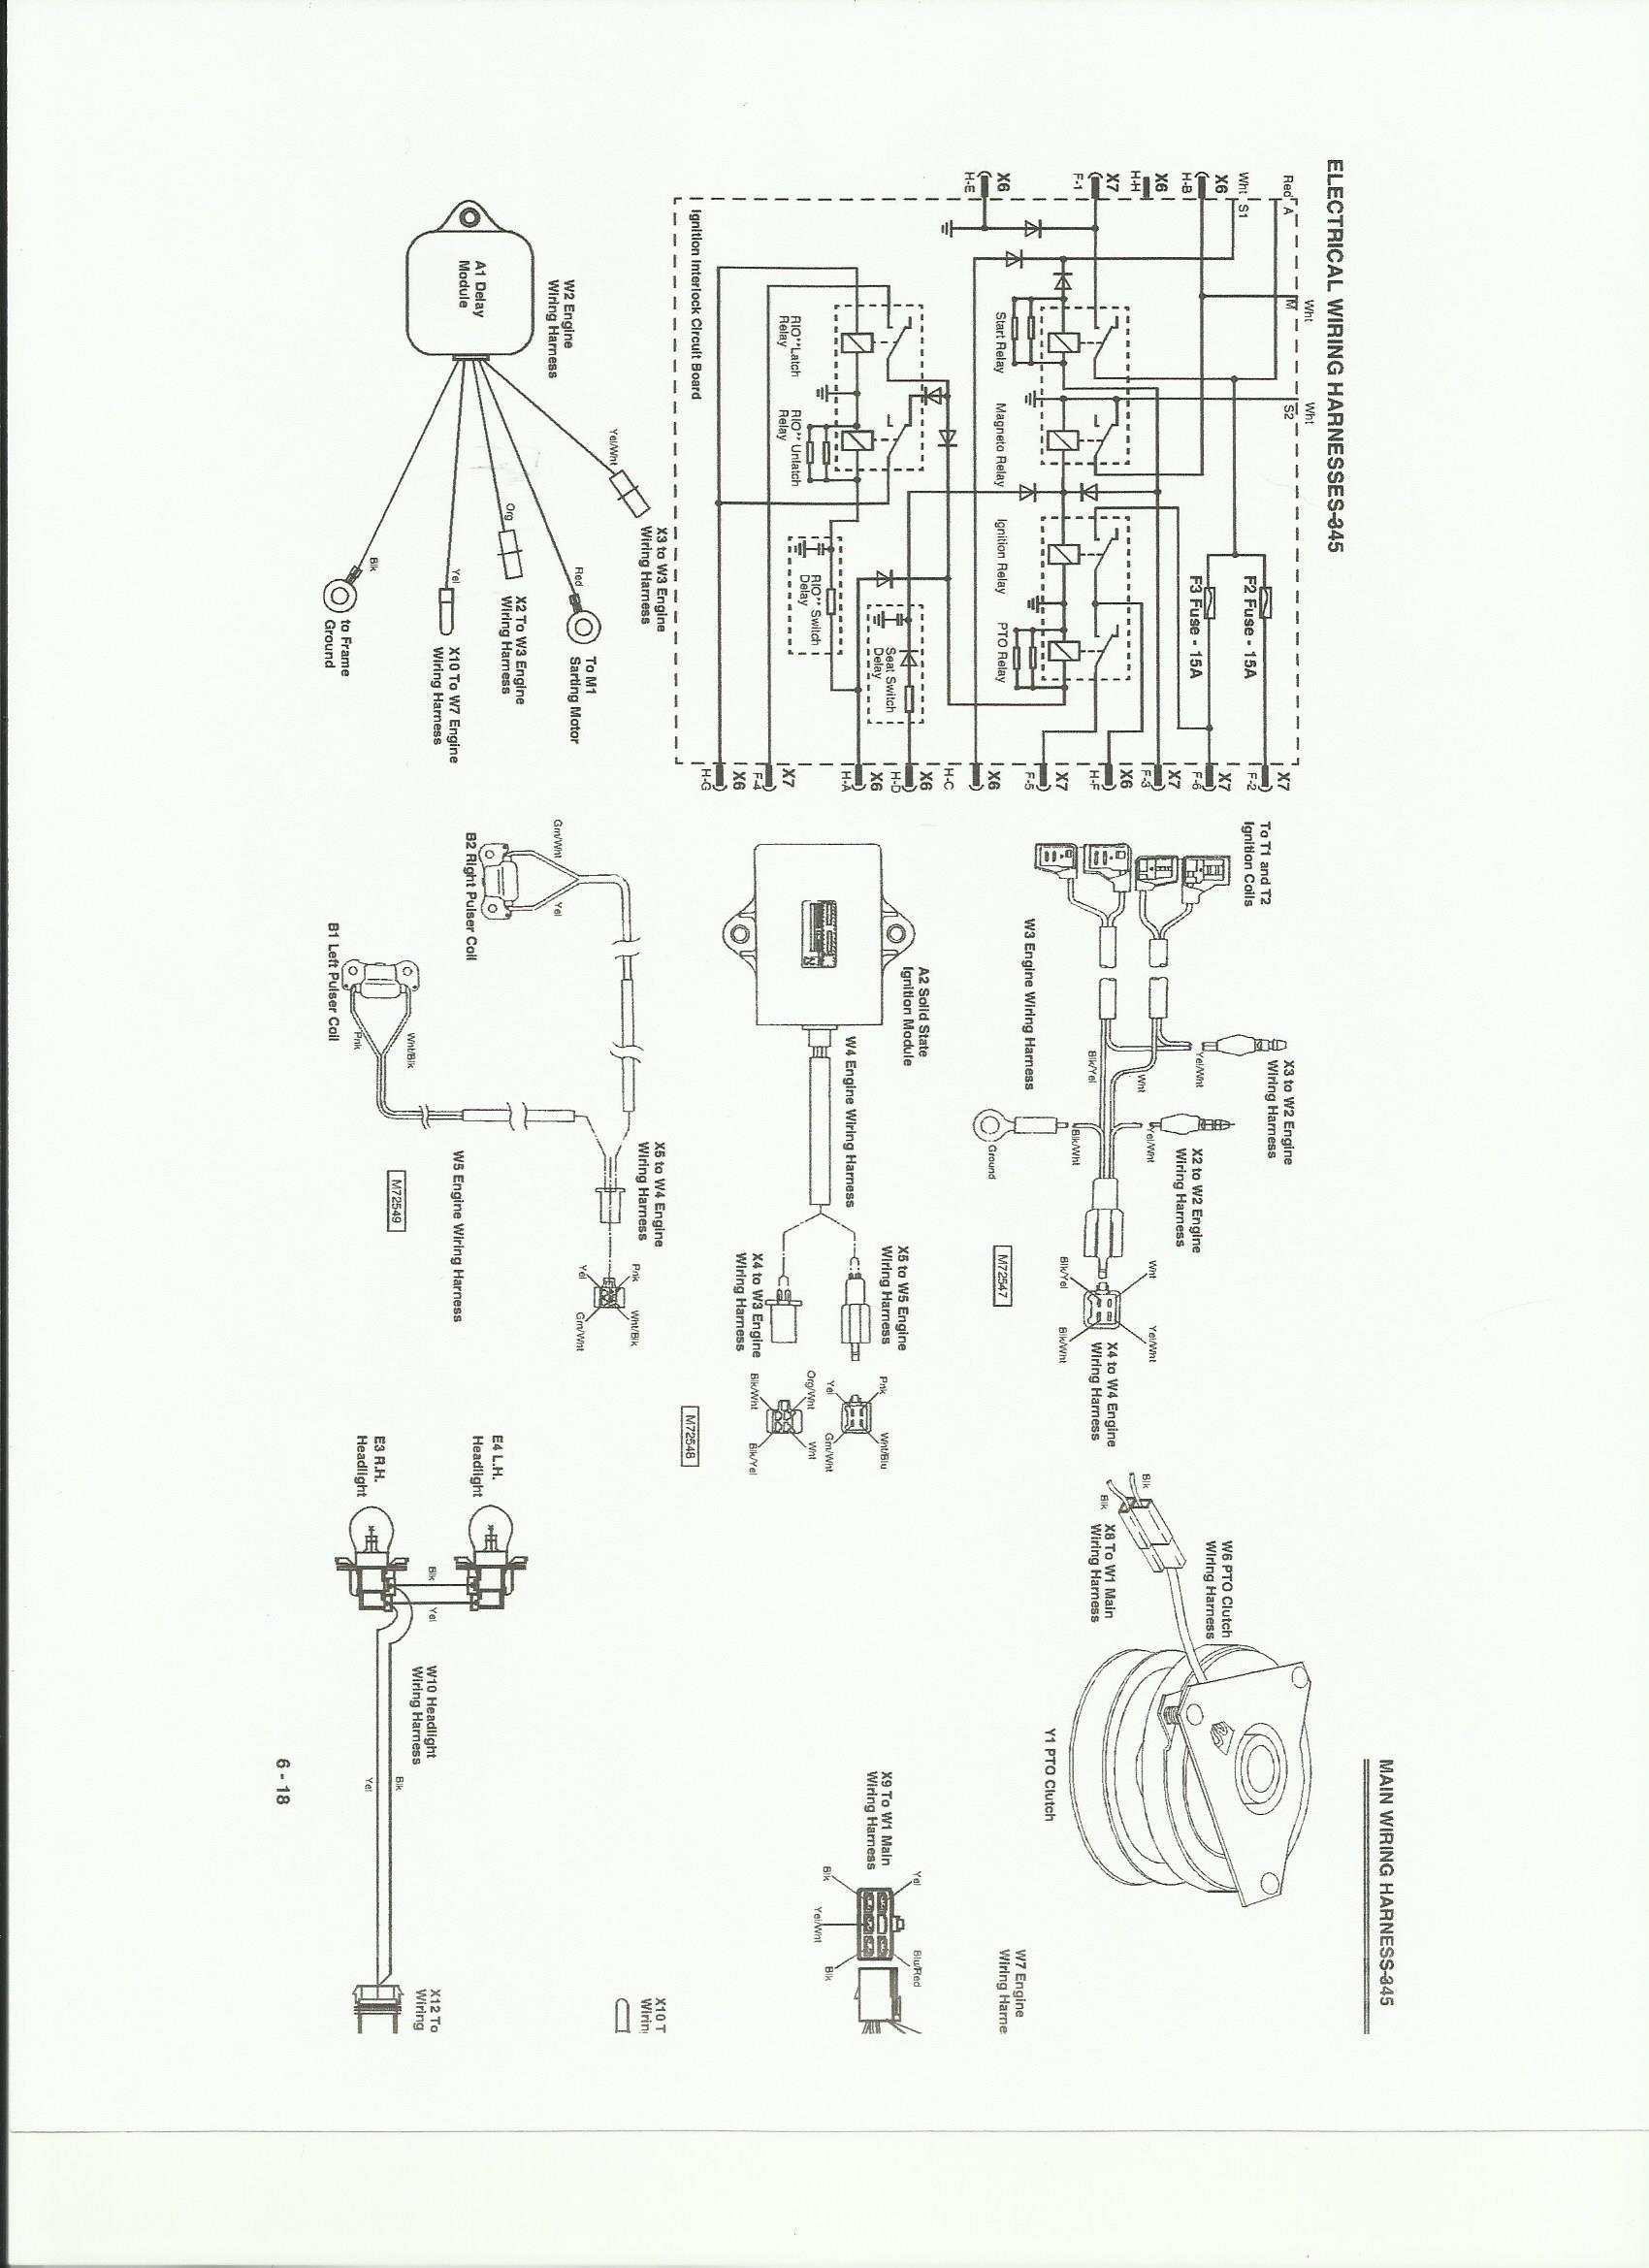 need a 345 wiring diagram pdf please